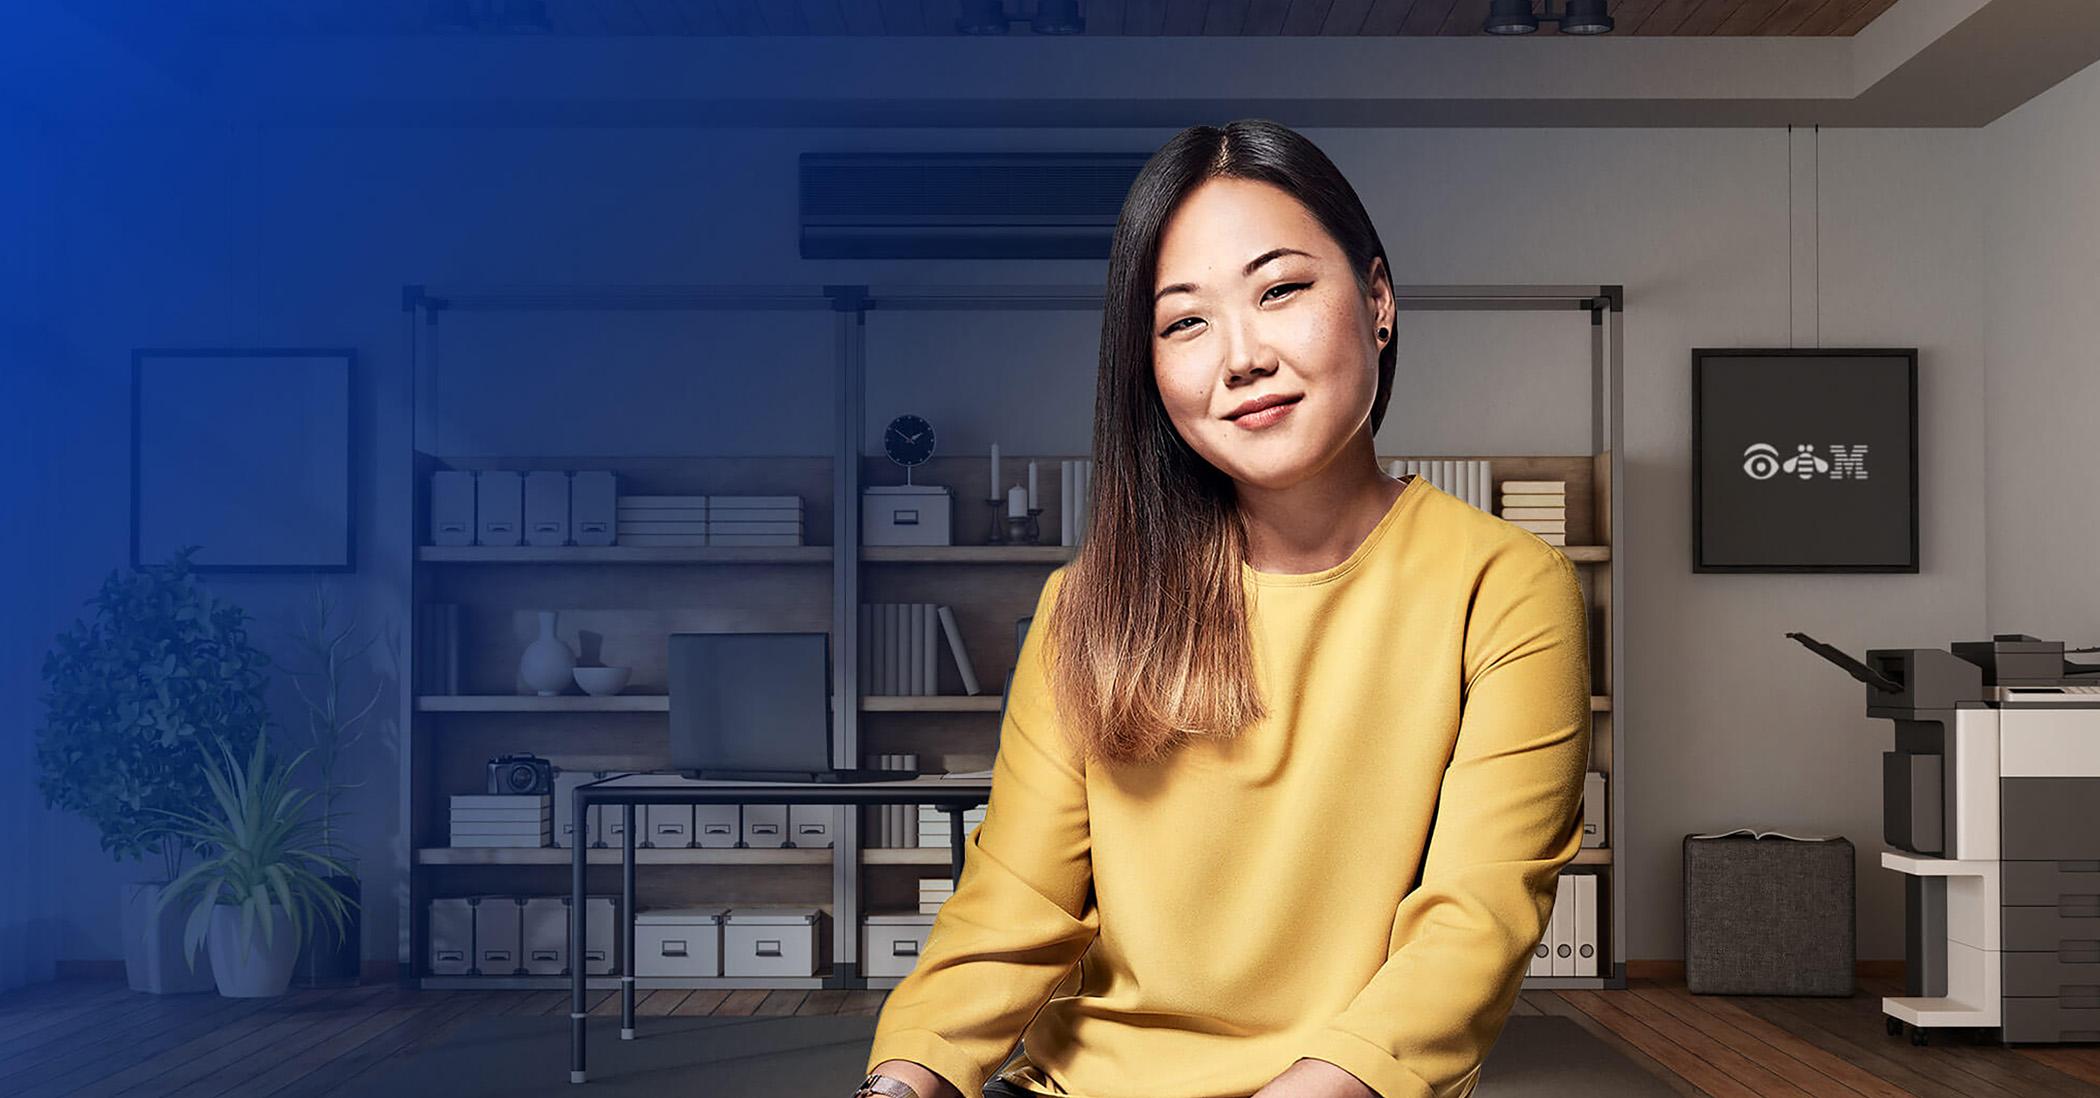 IBM employee Photo